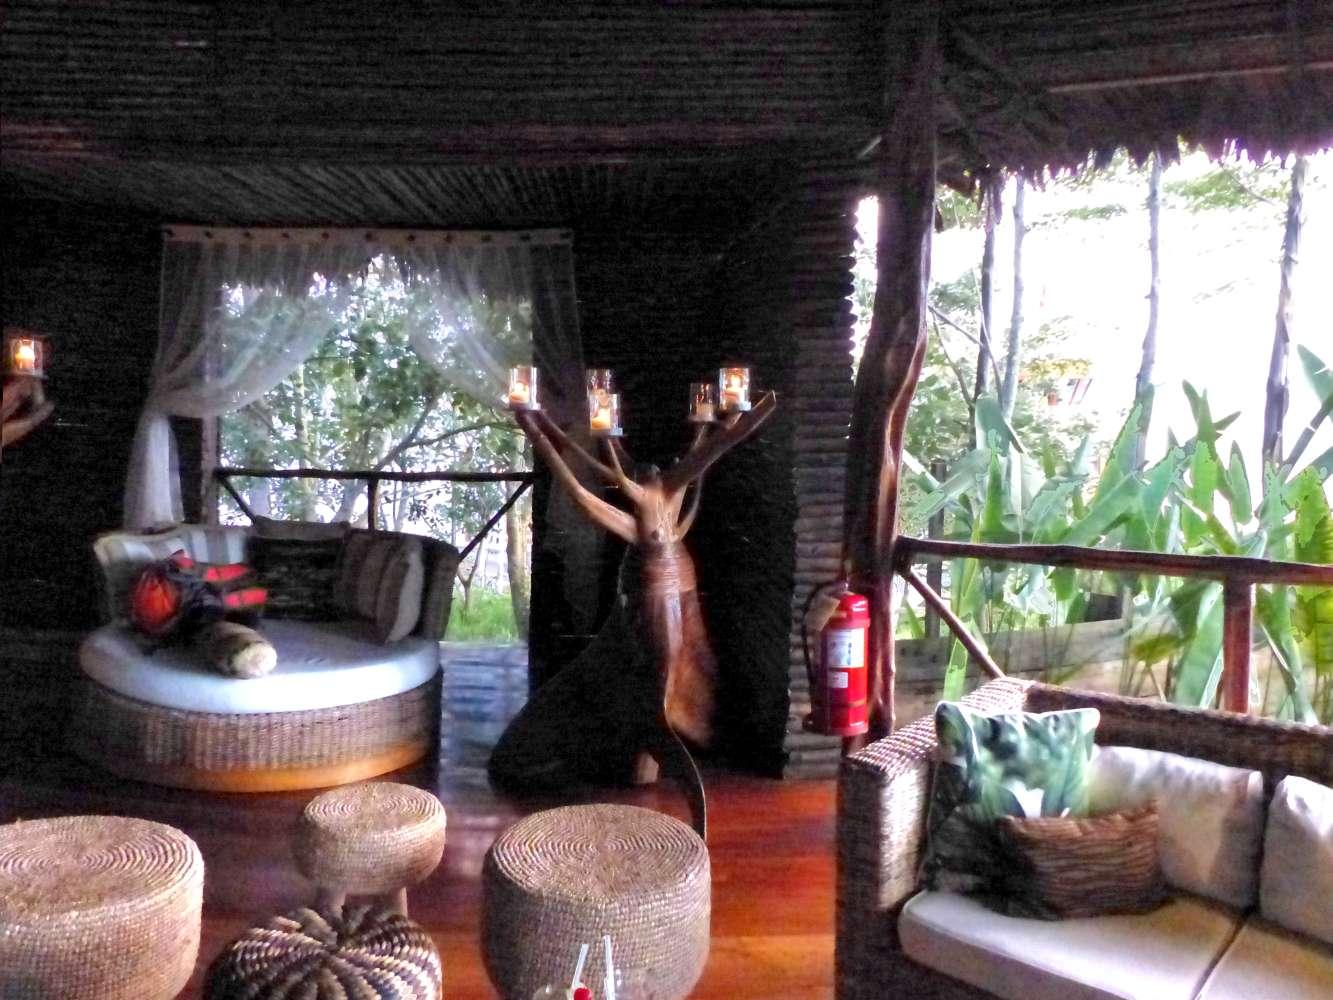 Amazon: The Ultimate Jungle Cruise, Part 1